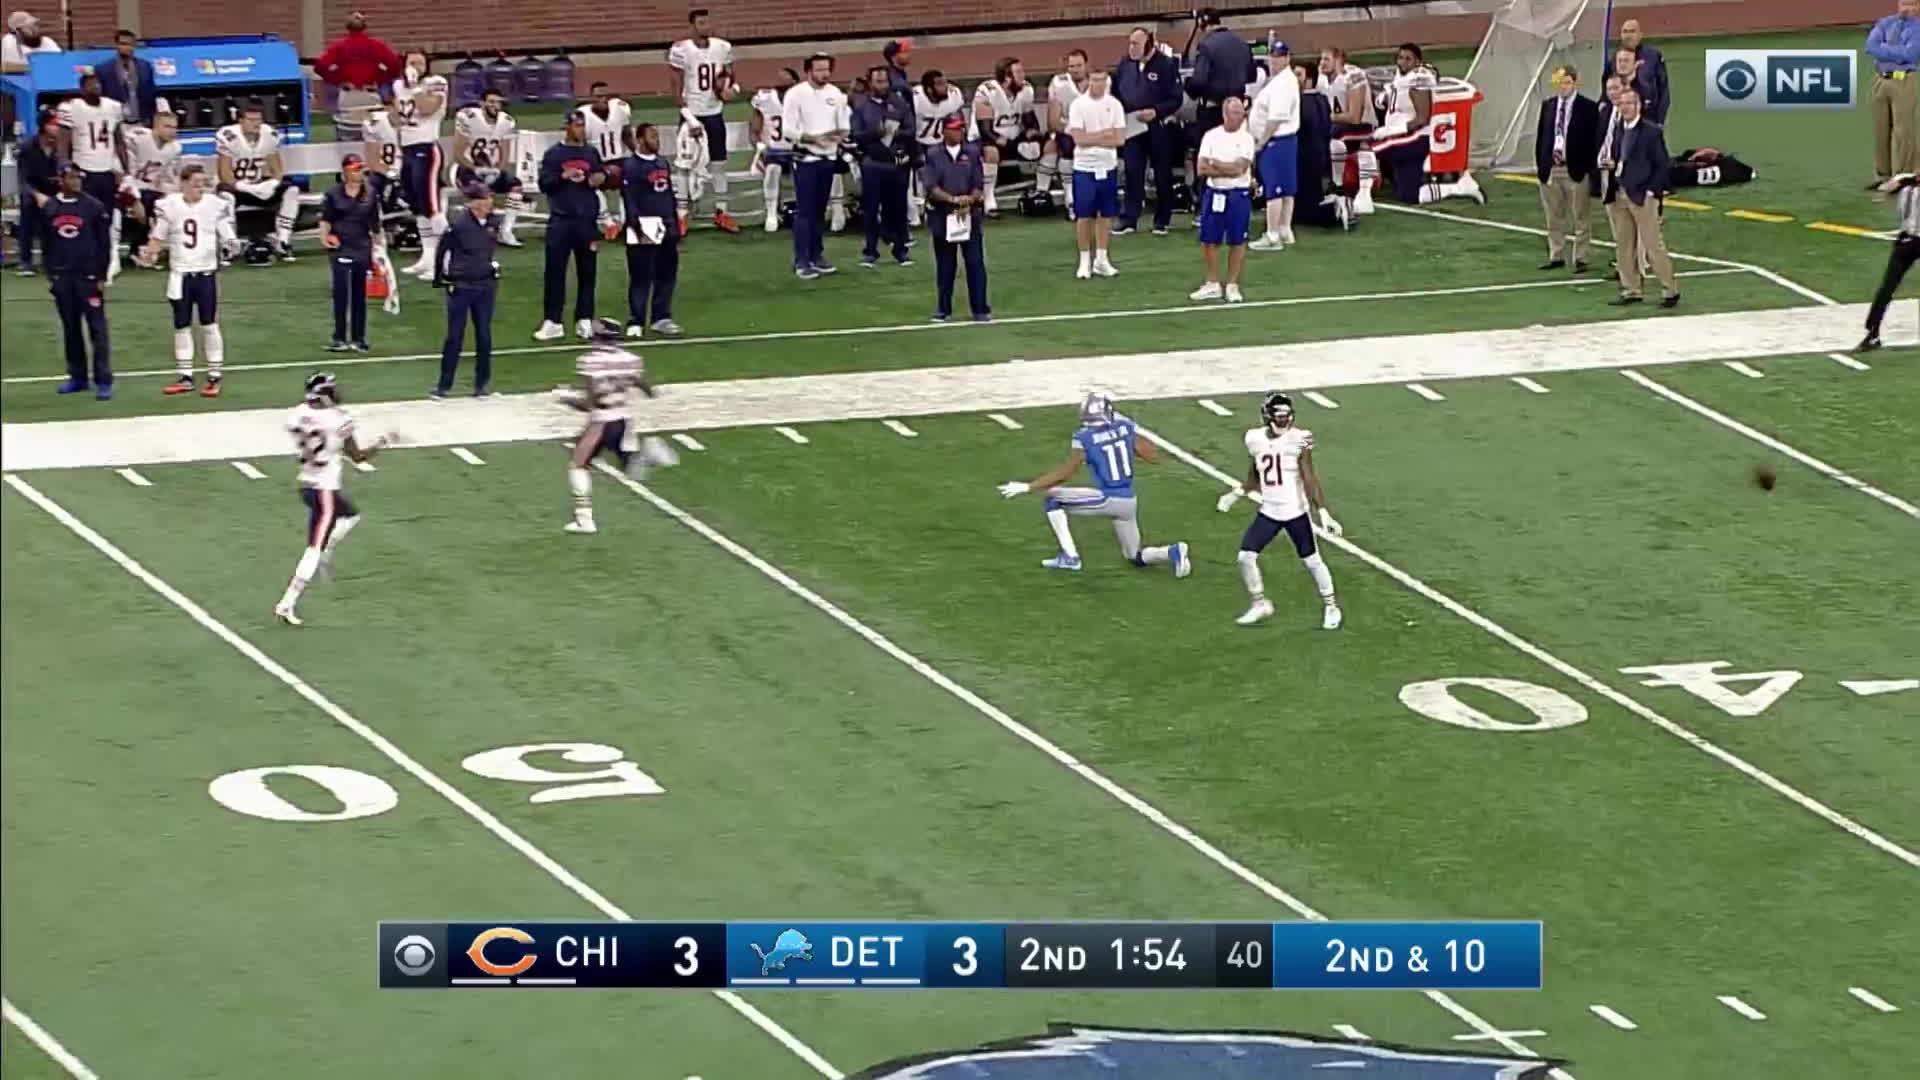 detroitlions, football, offense, Bears vs. Lions | NFL Week 14 Game Highlights GIFs